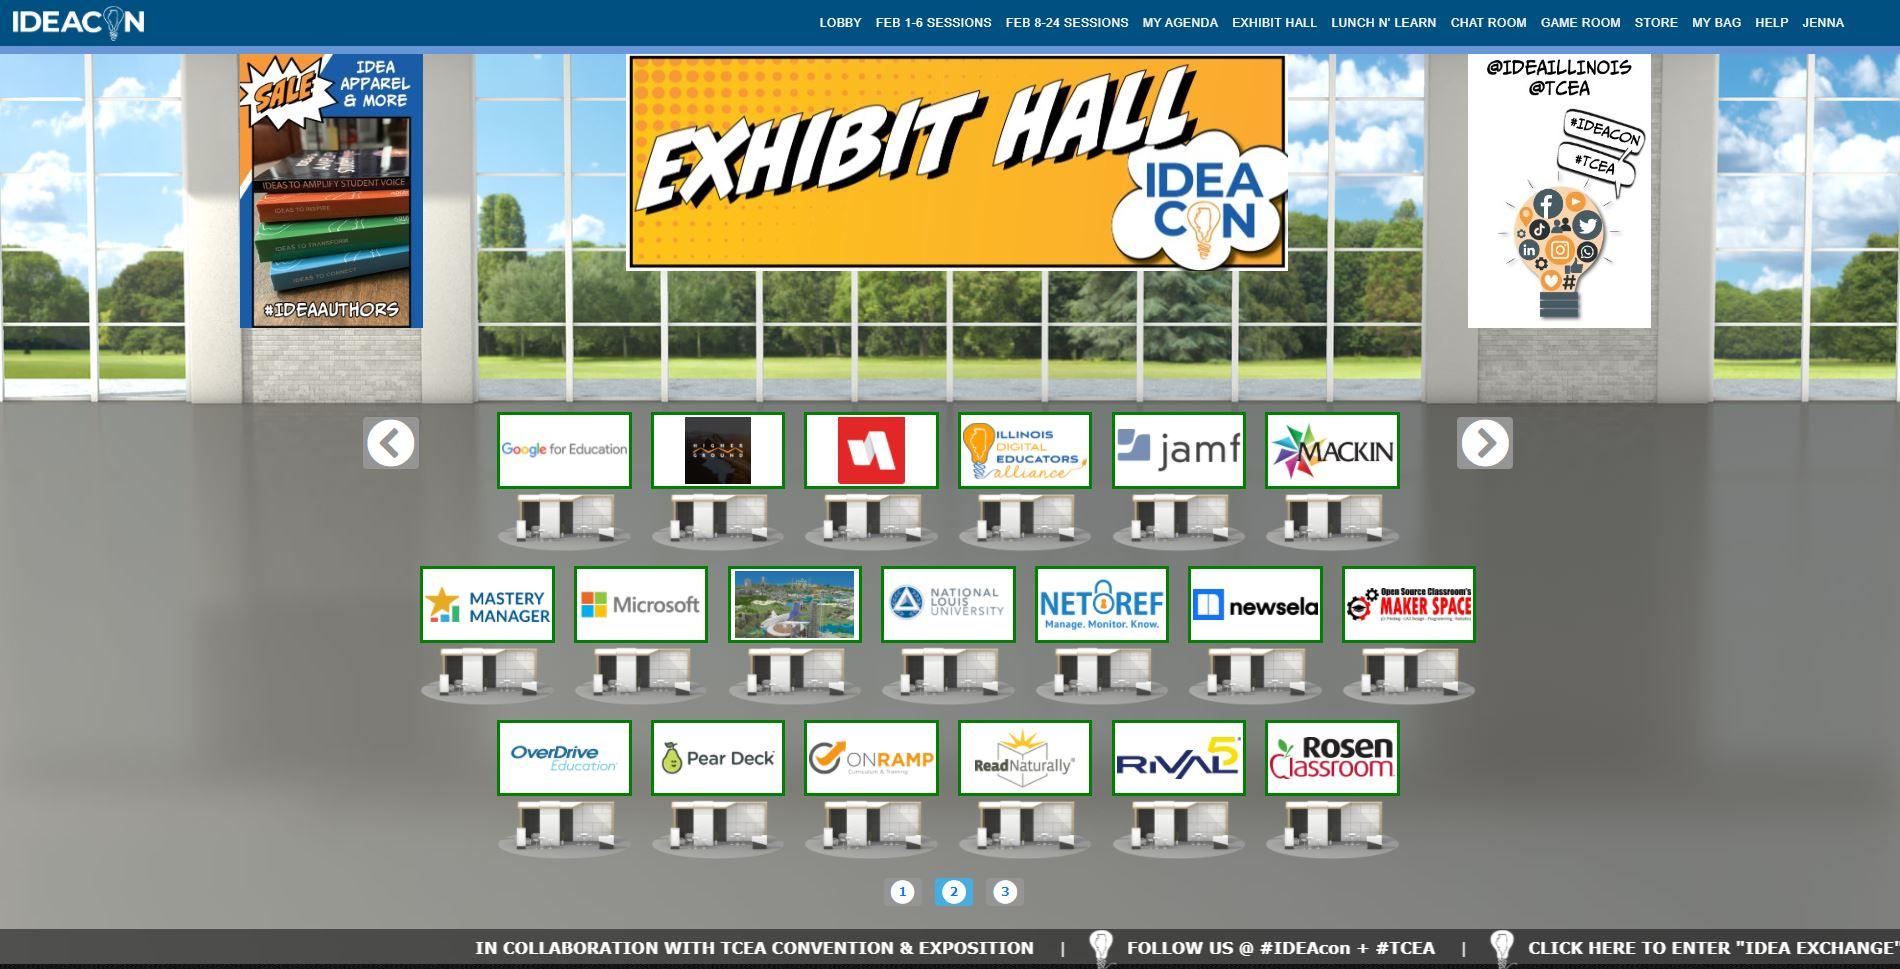 IDEAcon Exhibit Hall